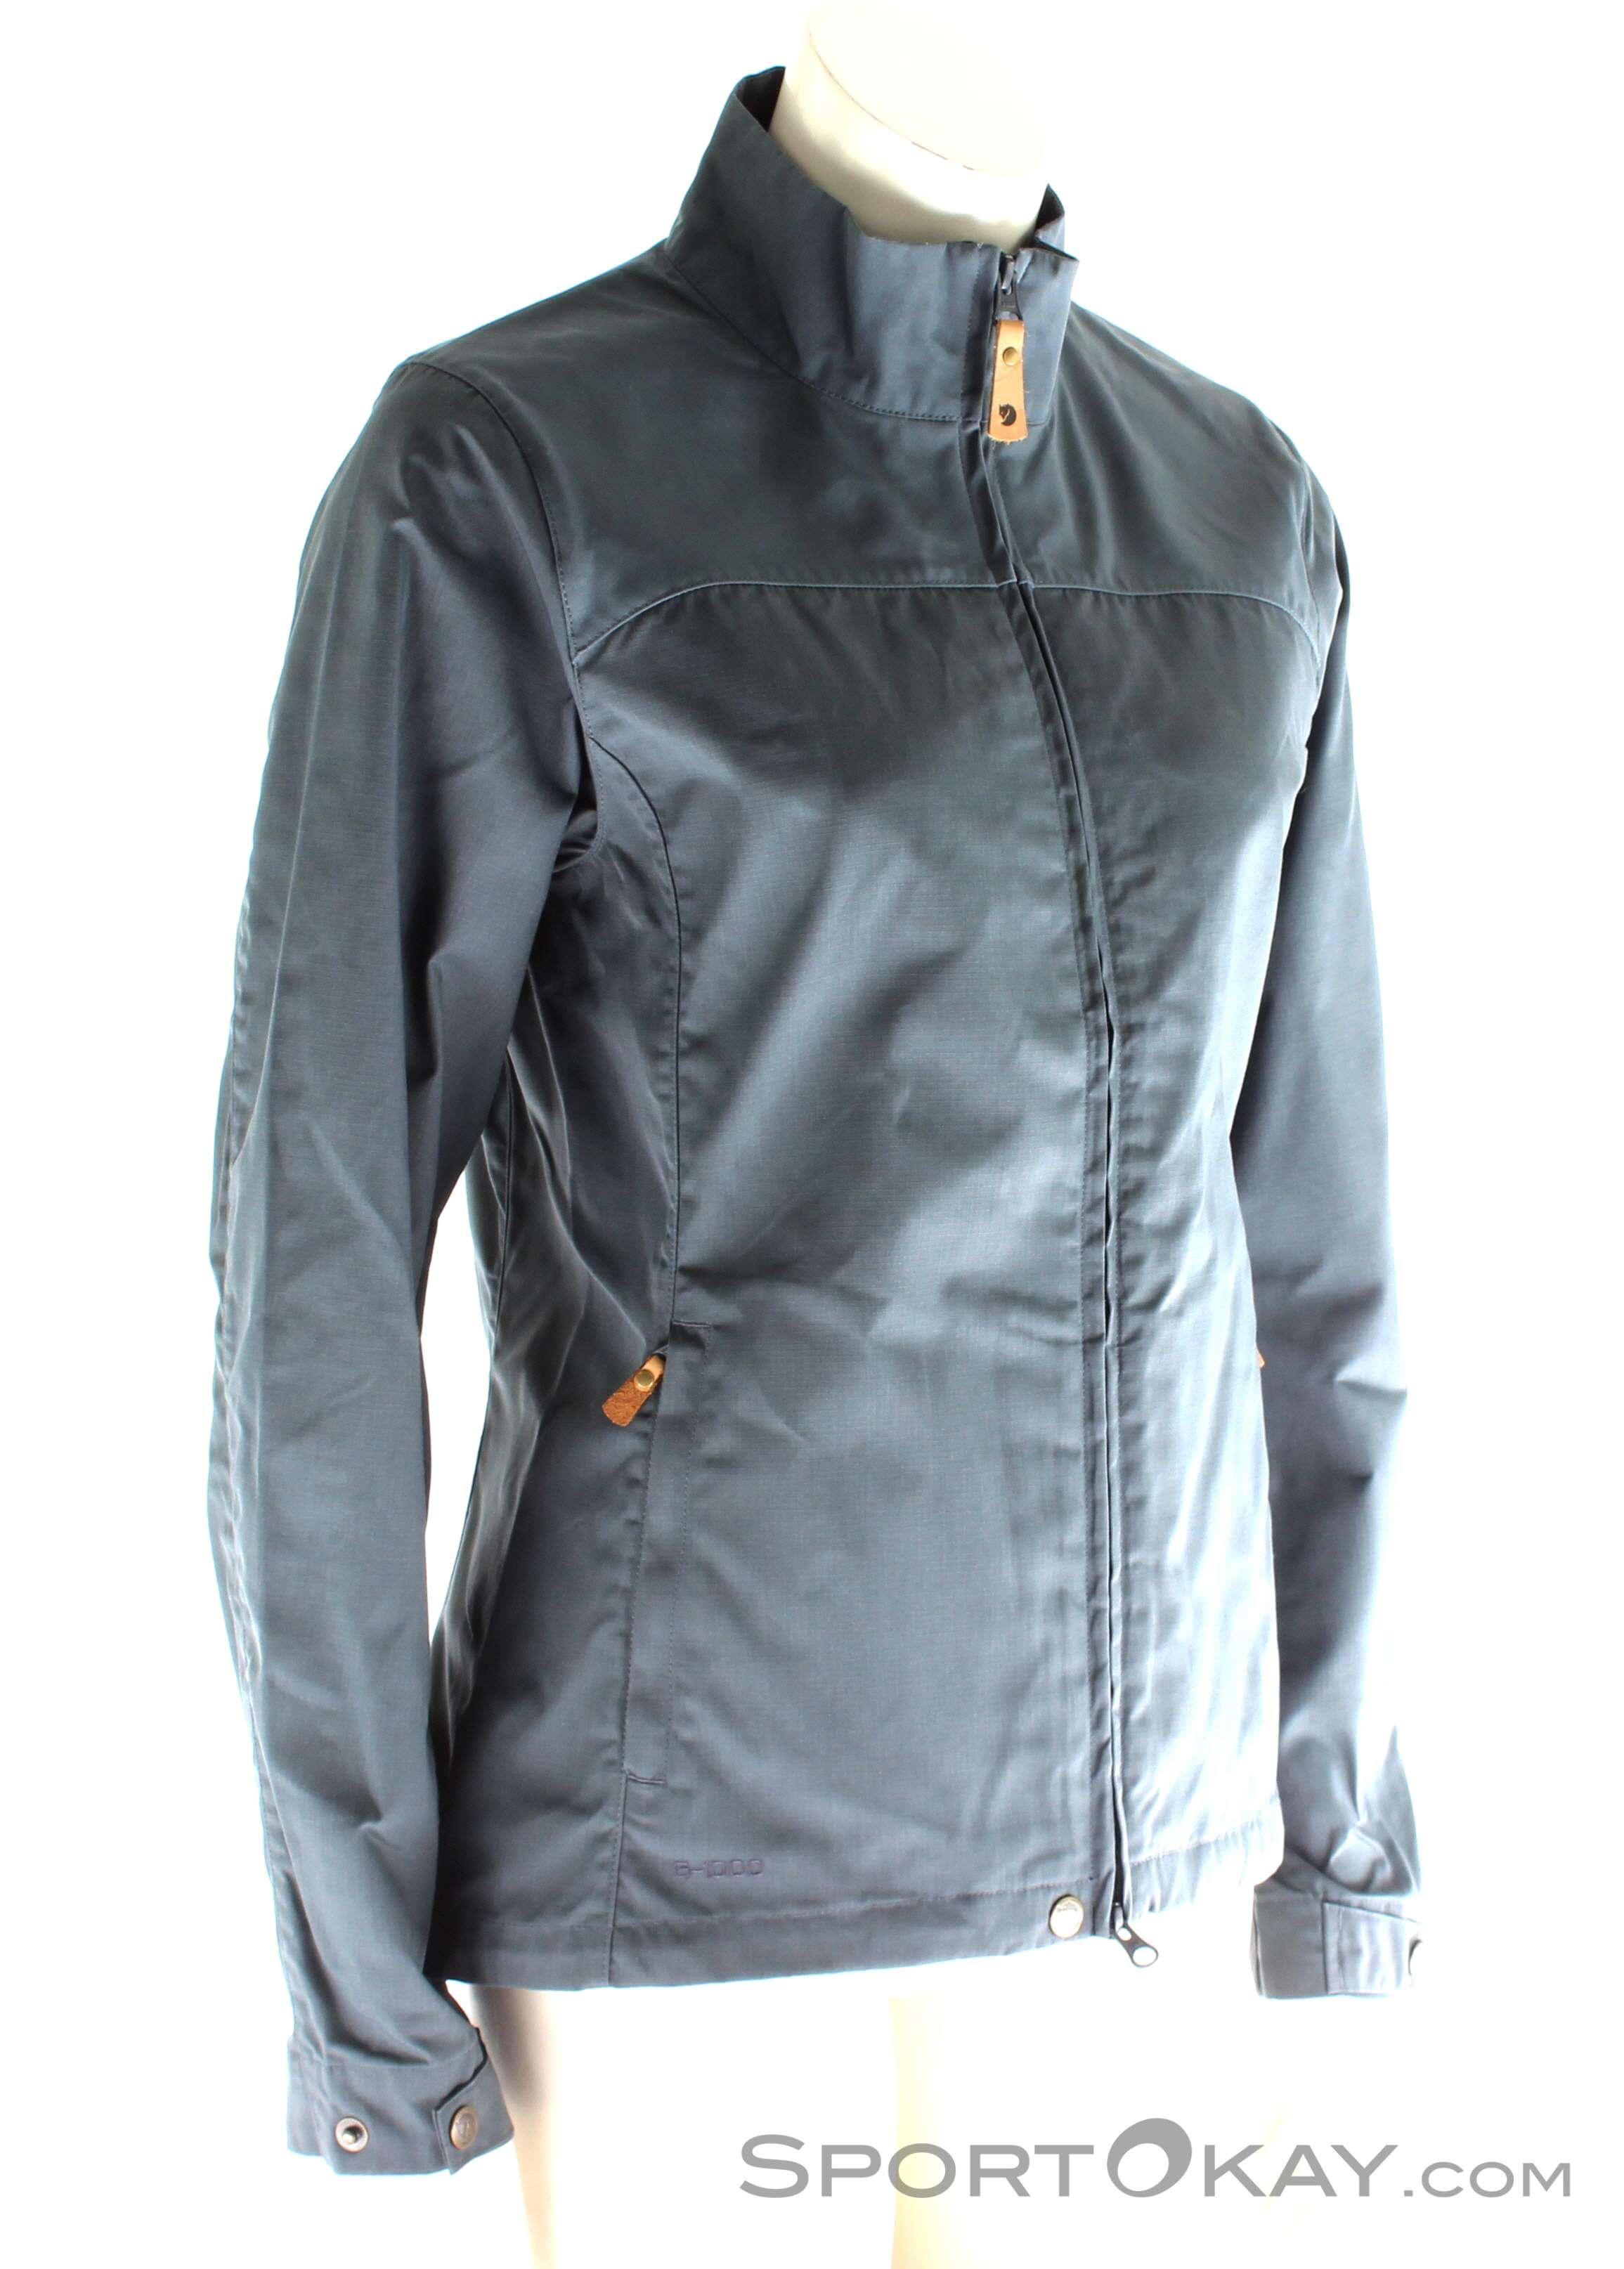 658d2110d4f3c3 Fjällraven Kiruna Lite Jacket Damen Outdoorjacke - Jacken ...